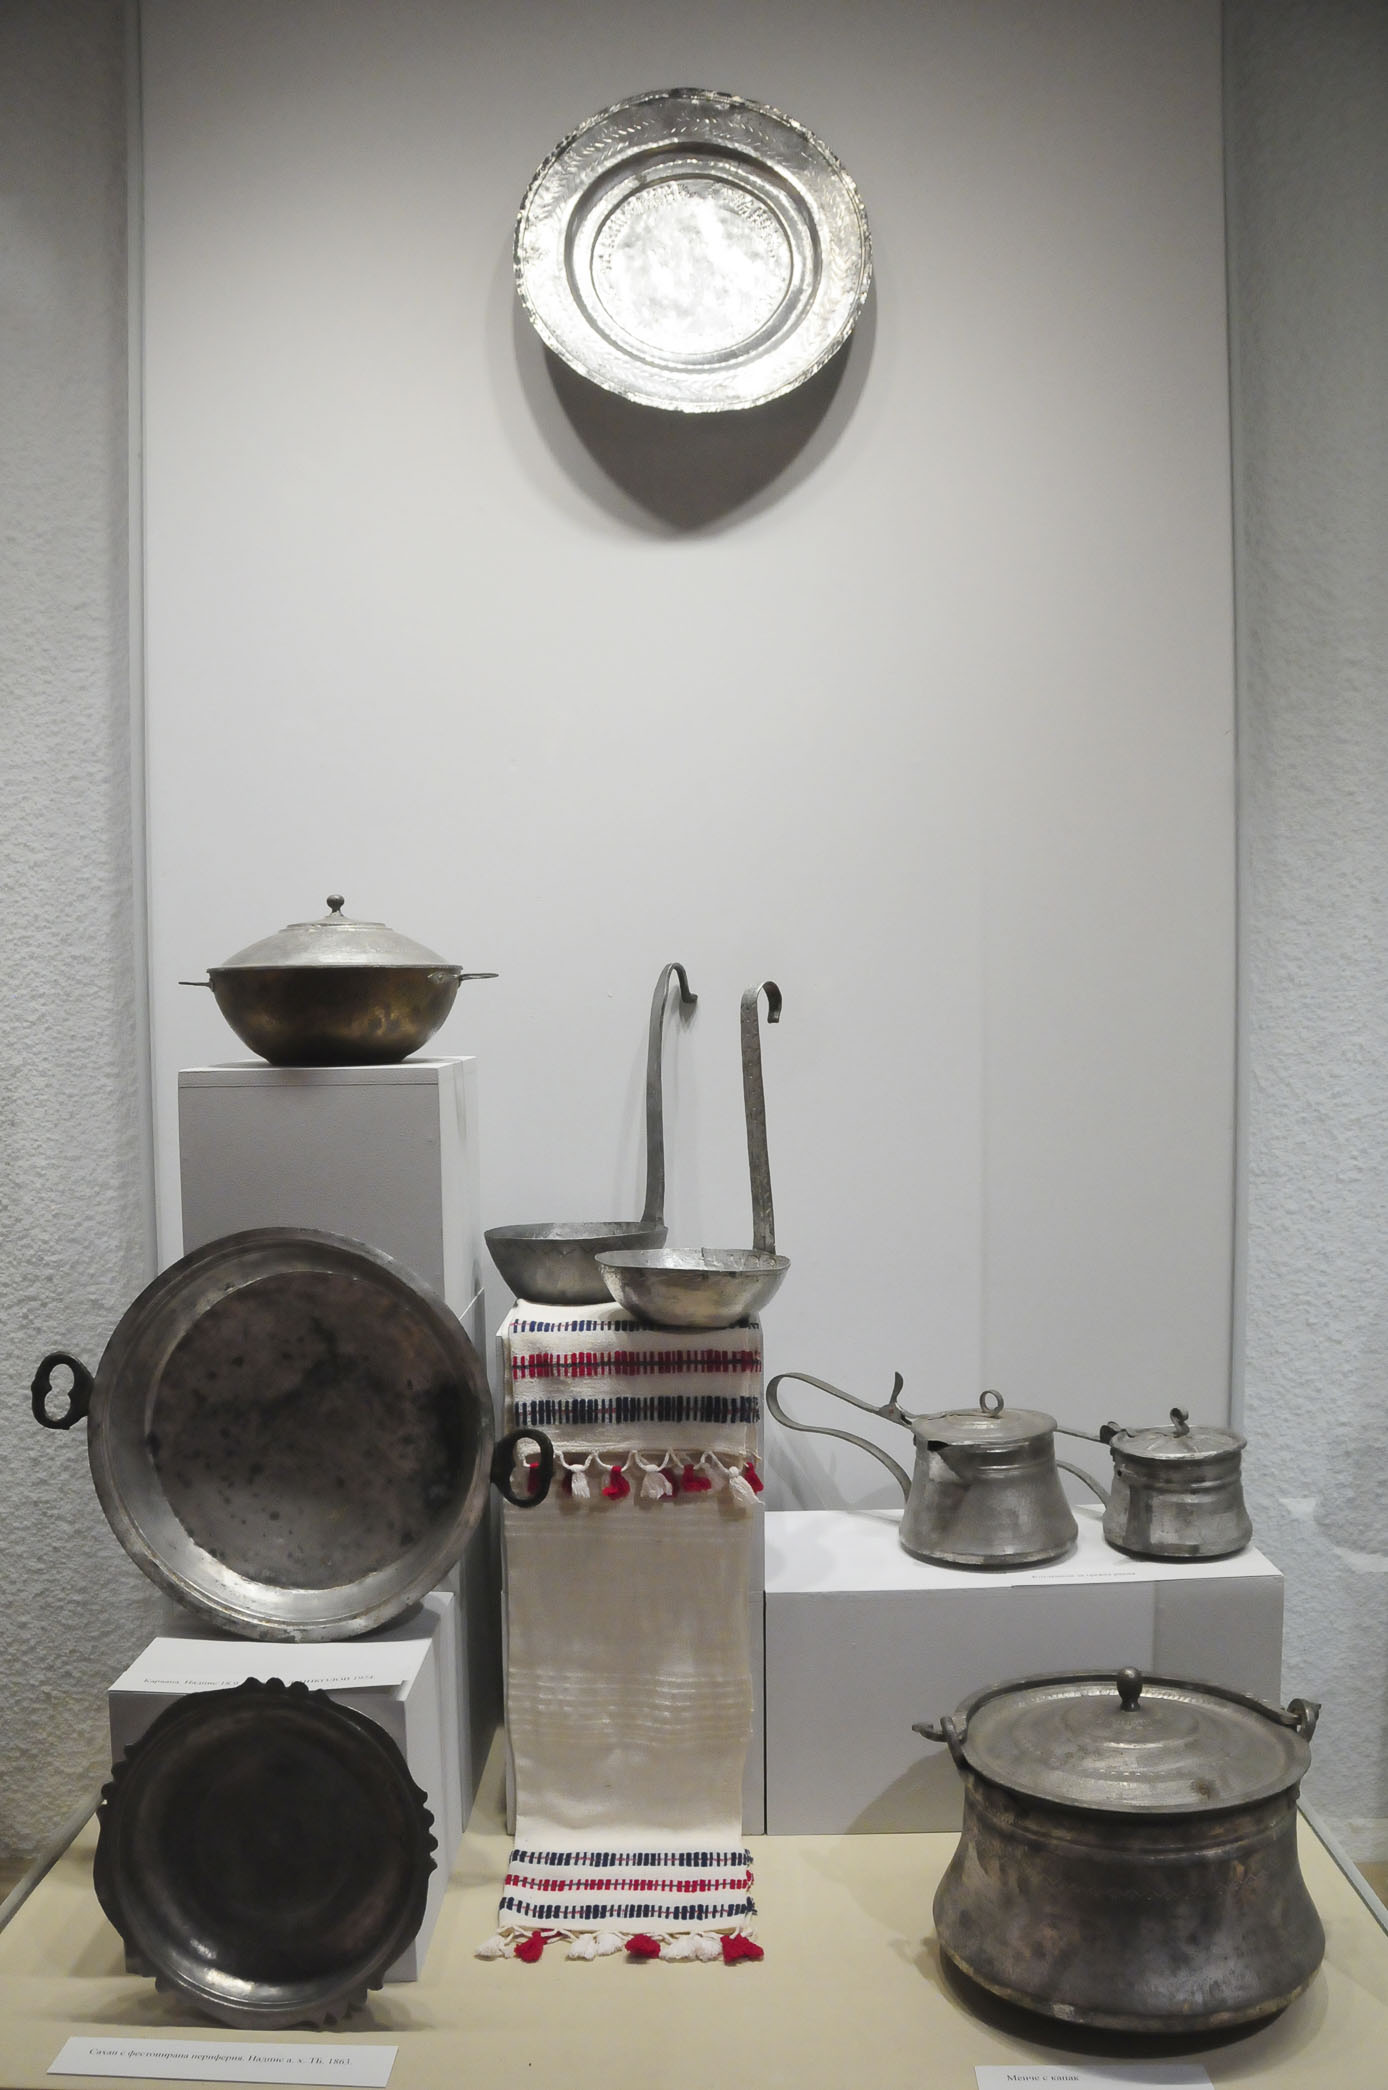 troyan-museum-mednikarstvo-ot-troyanskiq-krai-17